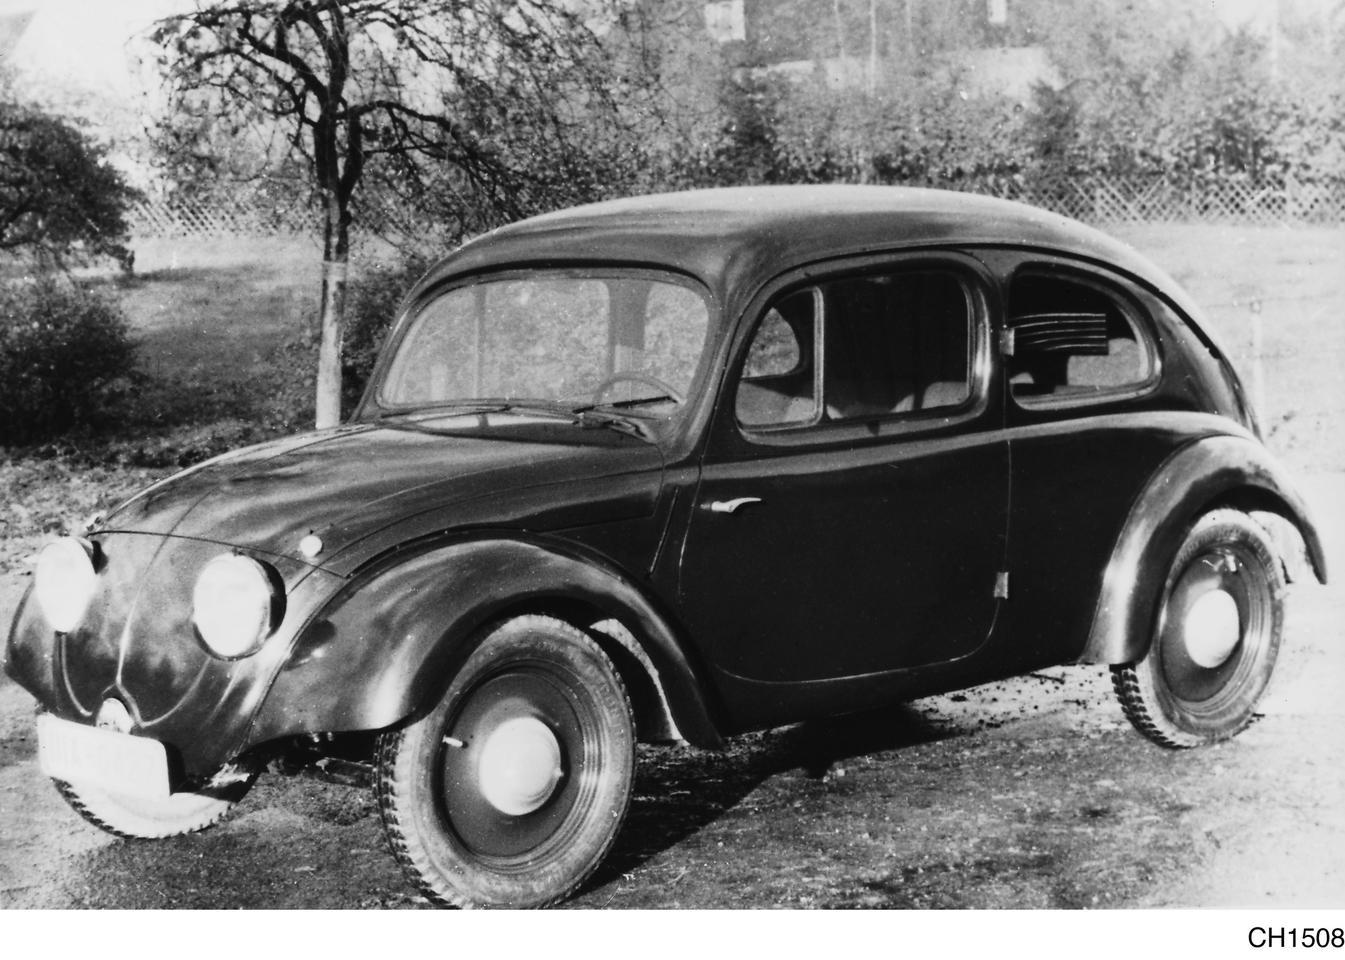 Опытный образец Beetle 1935/36 года.